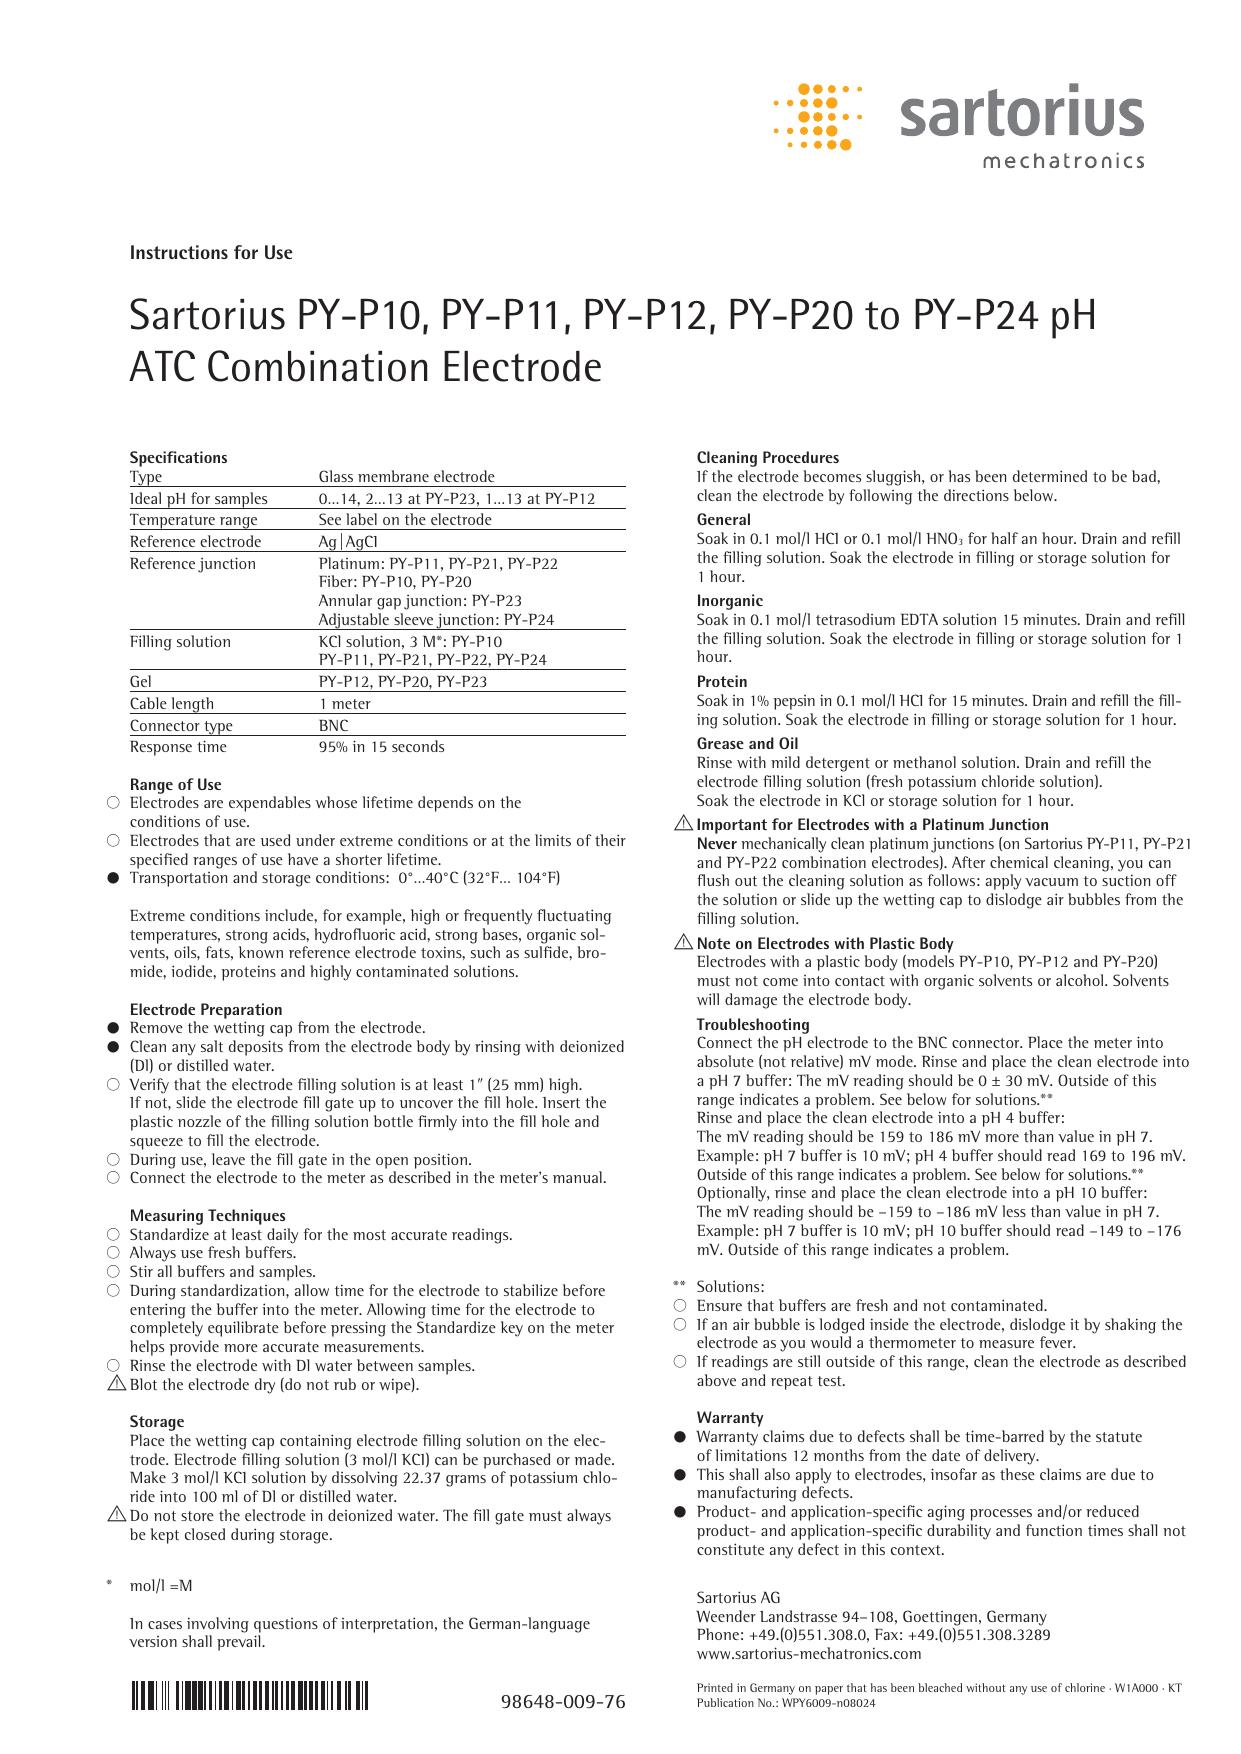 -5/°C to 100/°C Temperature Range Sartorius PY-P24 ATC Combination Electrode without Built In Temperature Sensor Plastic Body 0 to 14 pH Range